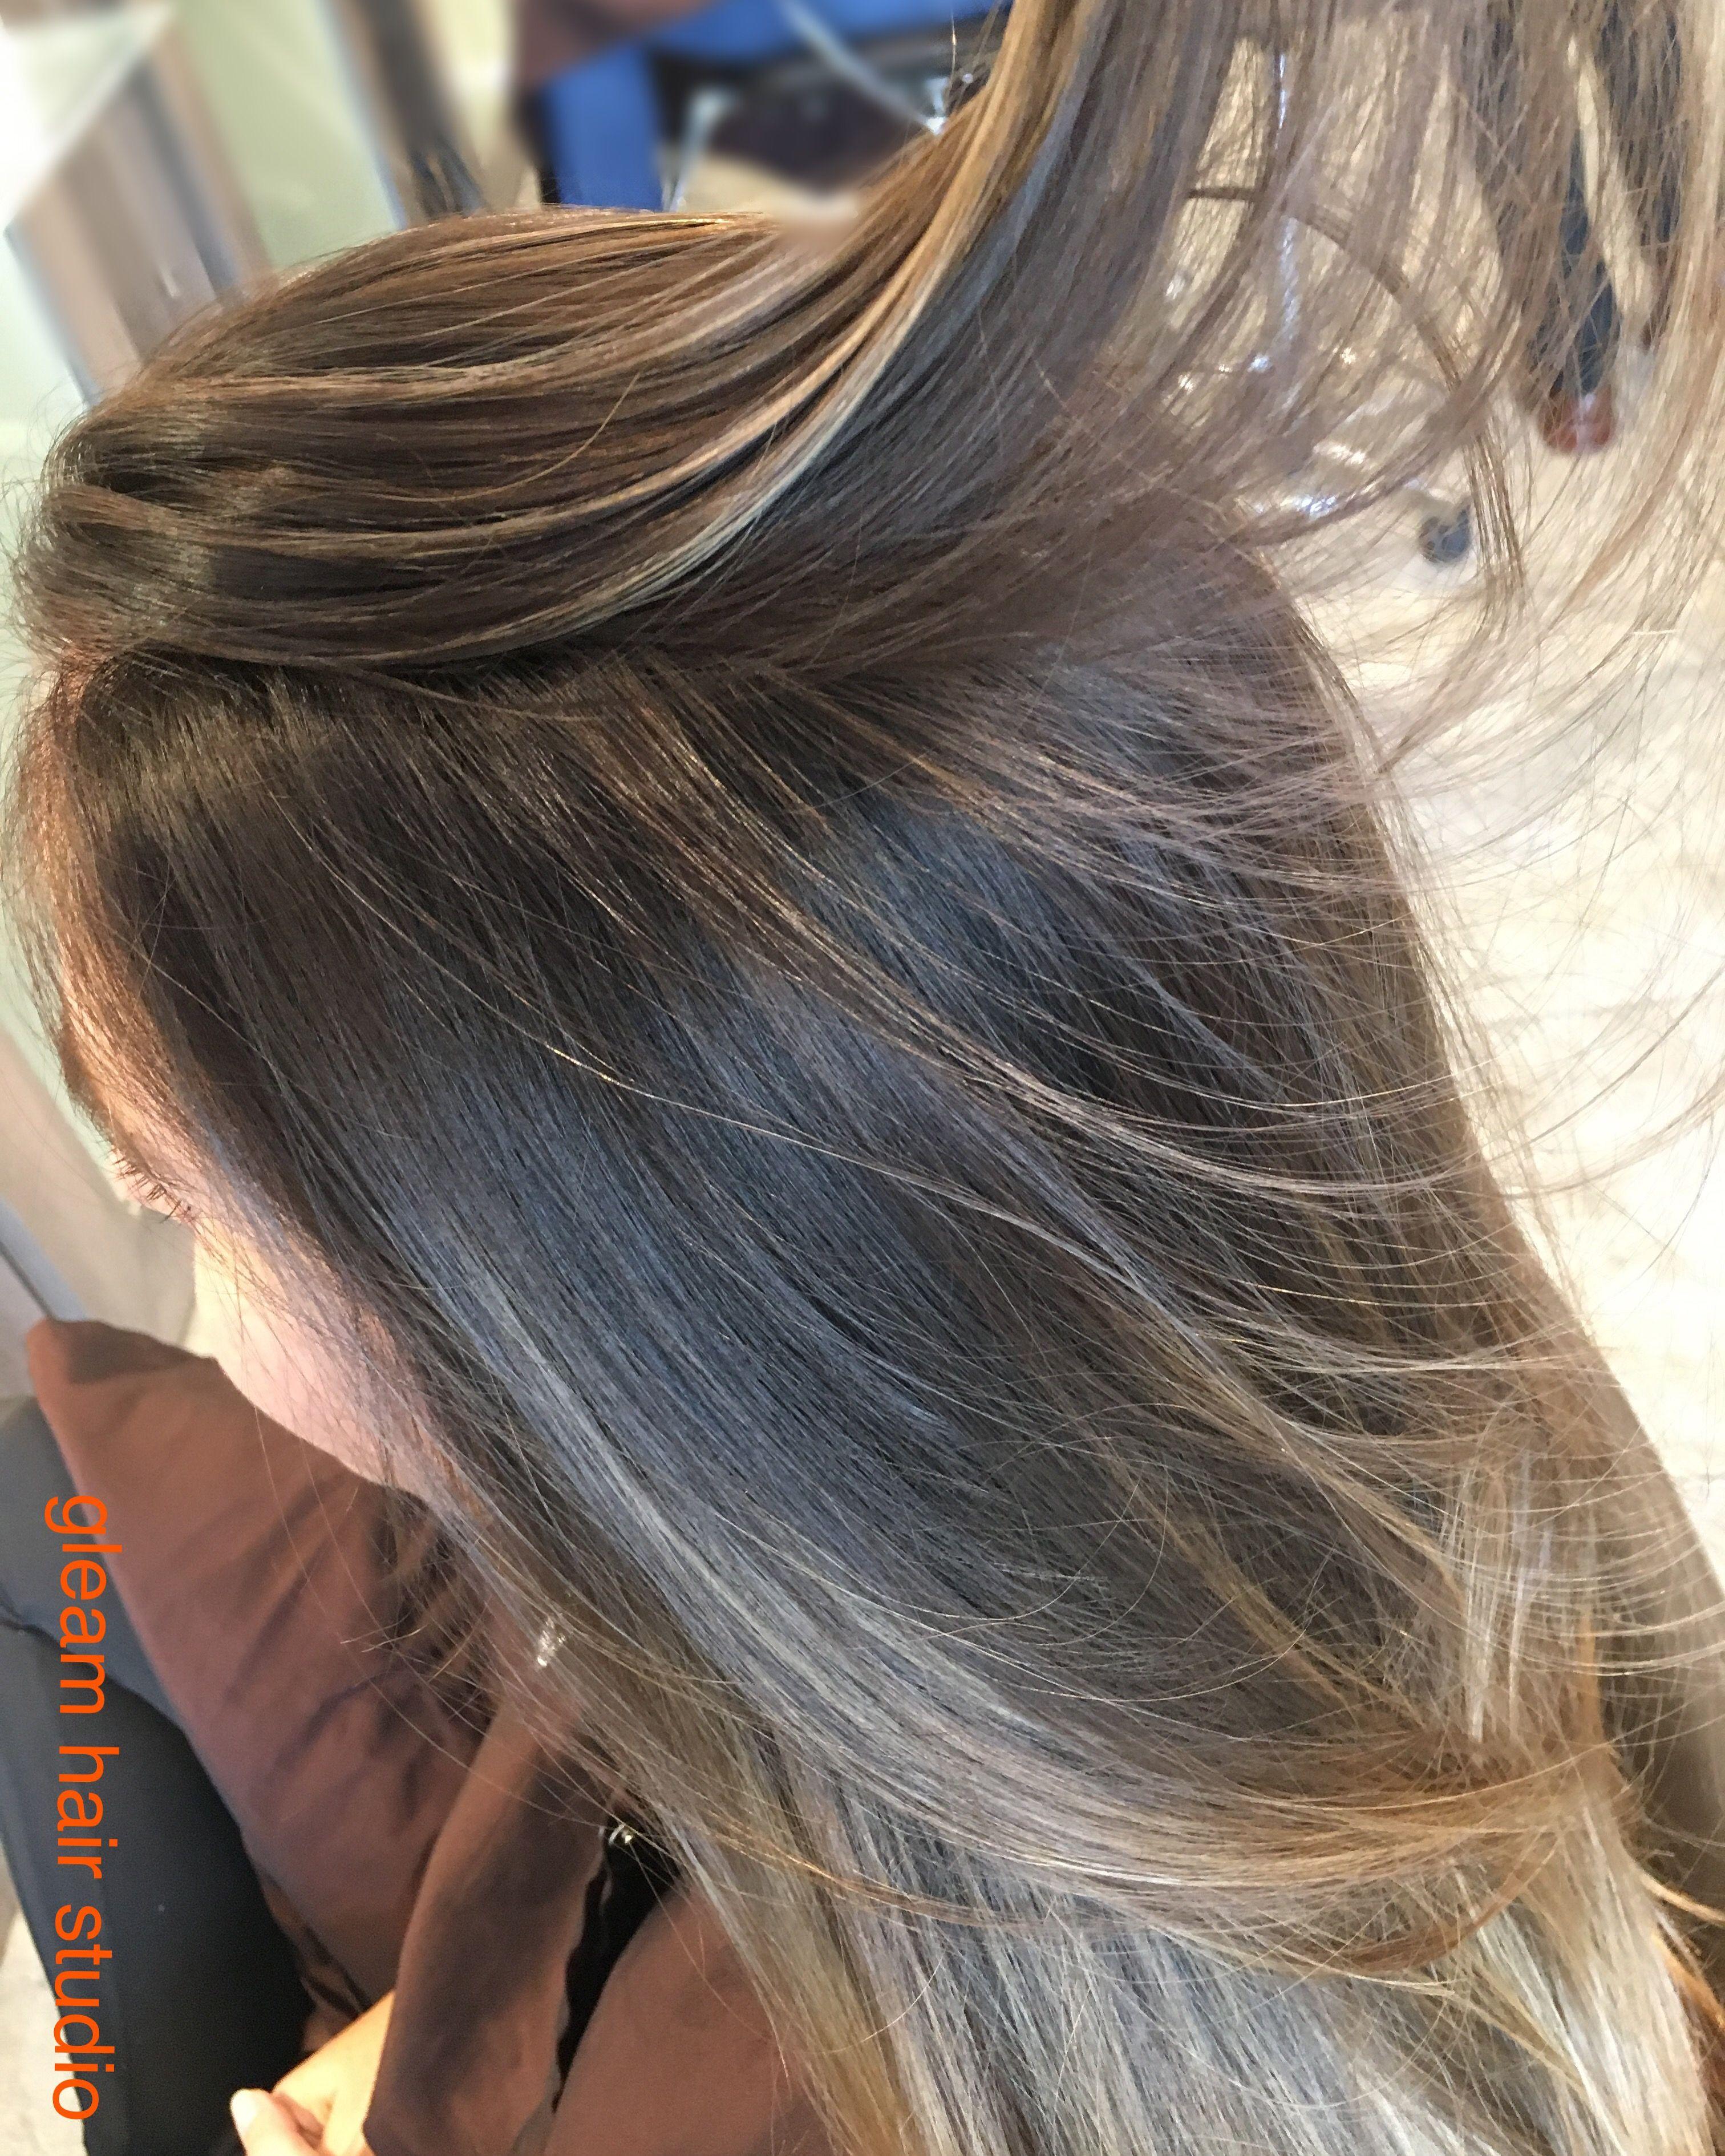 Natural Babylights By Peter Gleam Hair Studio Miami Best Hair Salon Hair Top Hair Salon